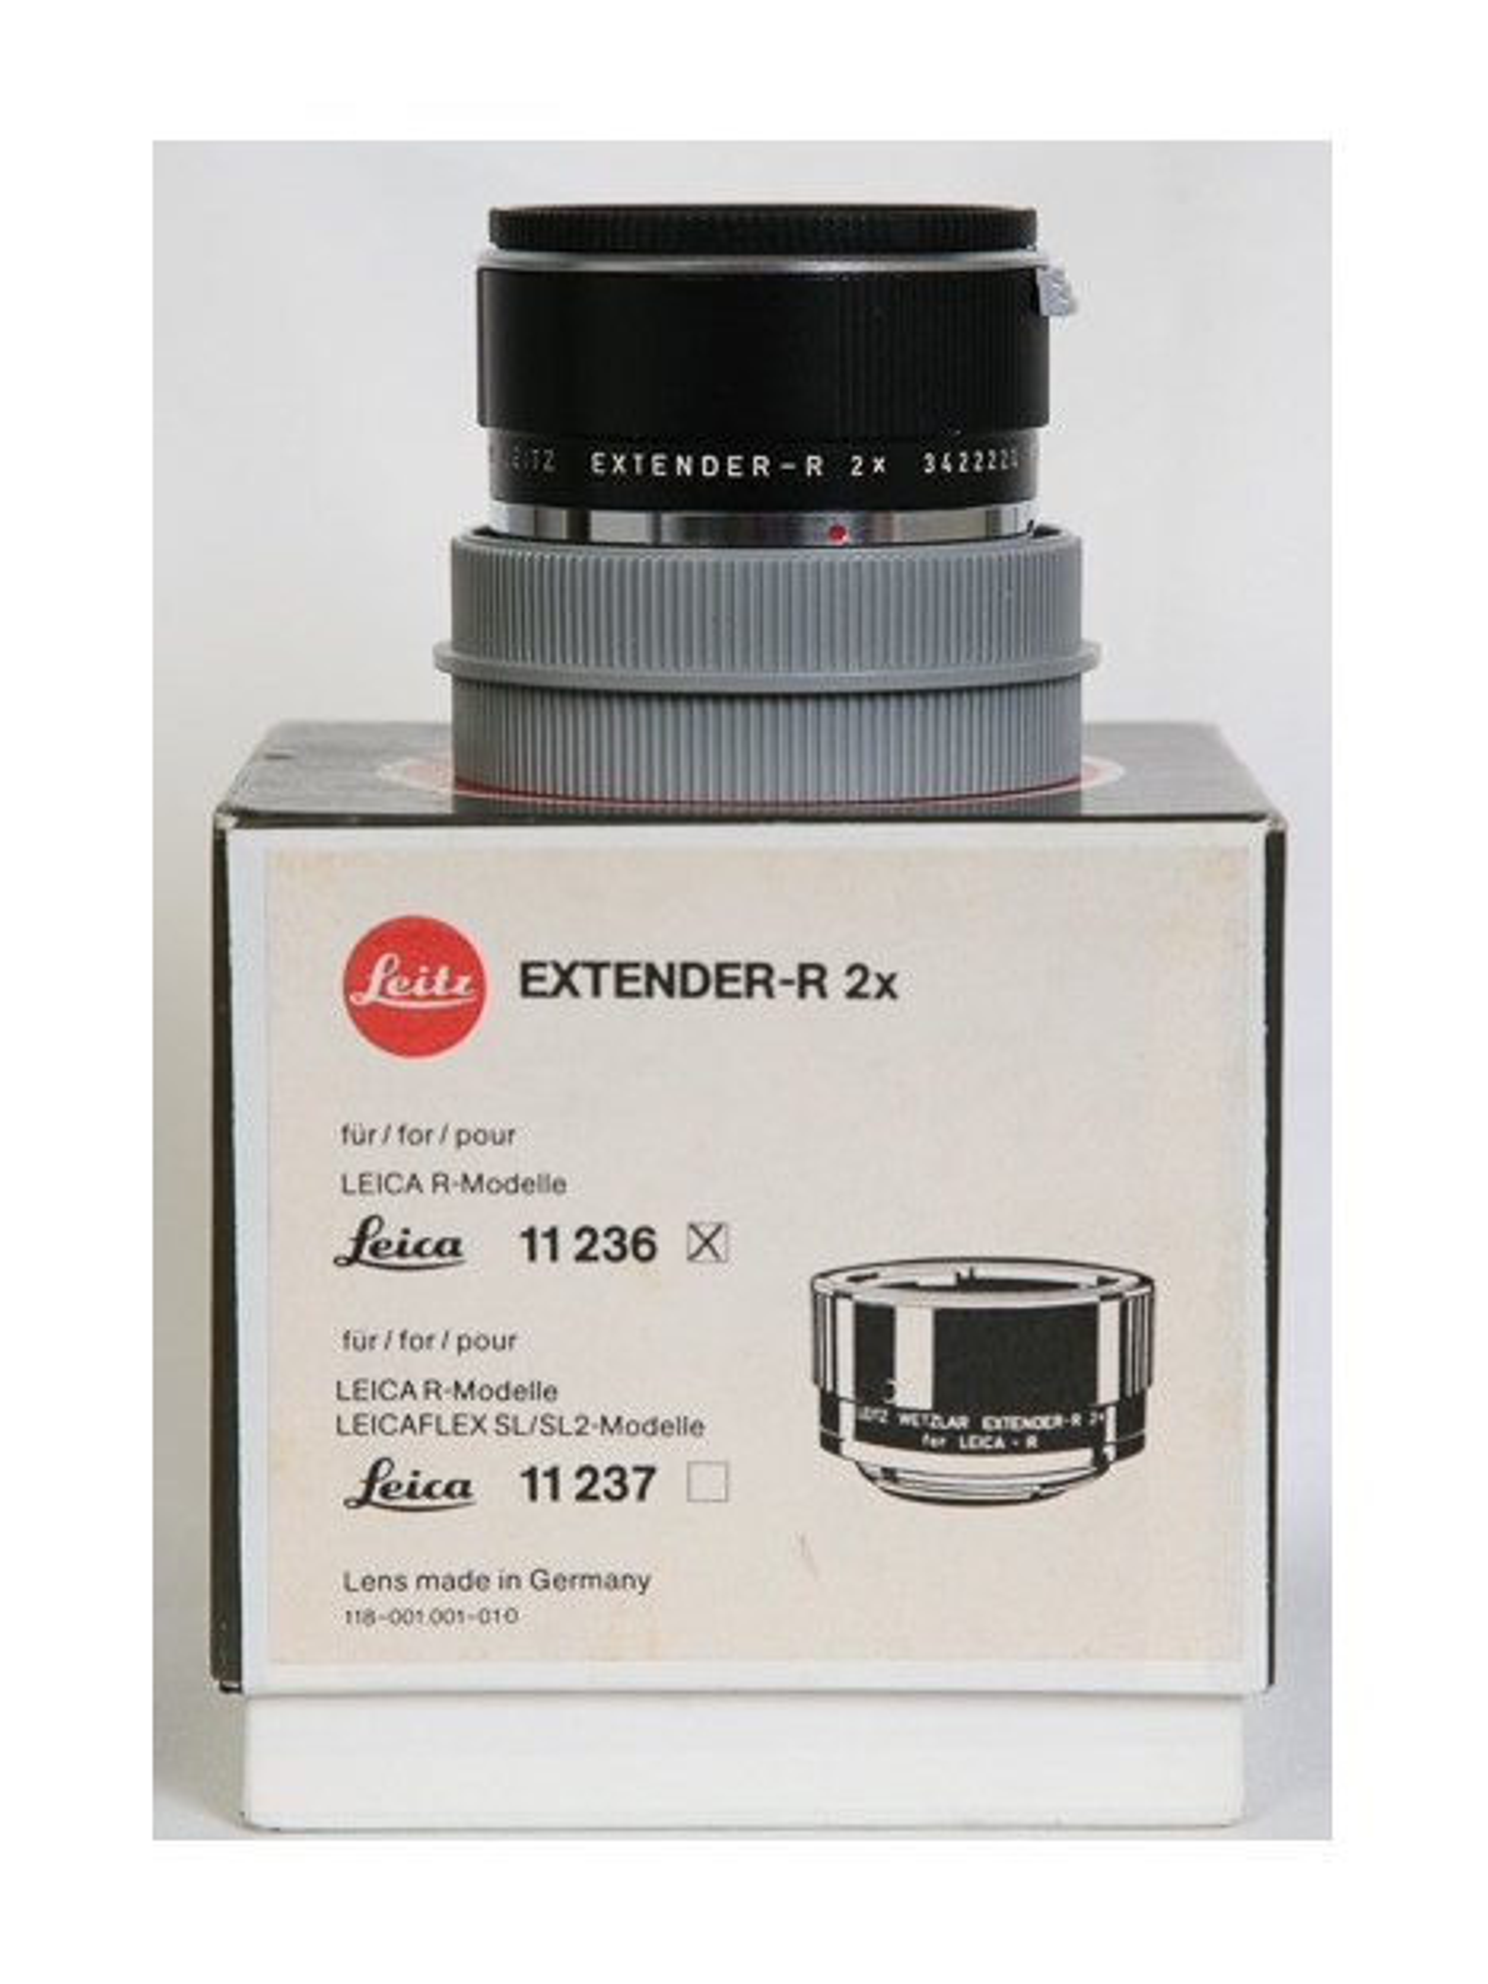 Extender R sn 3422220